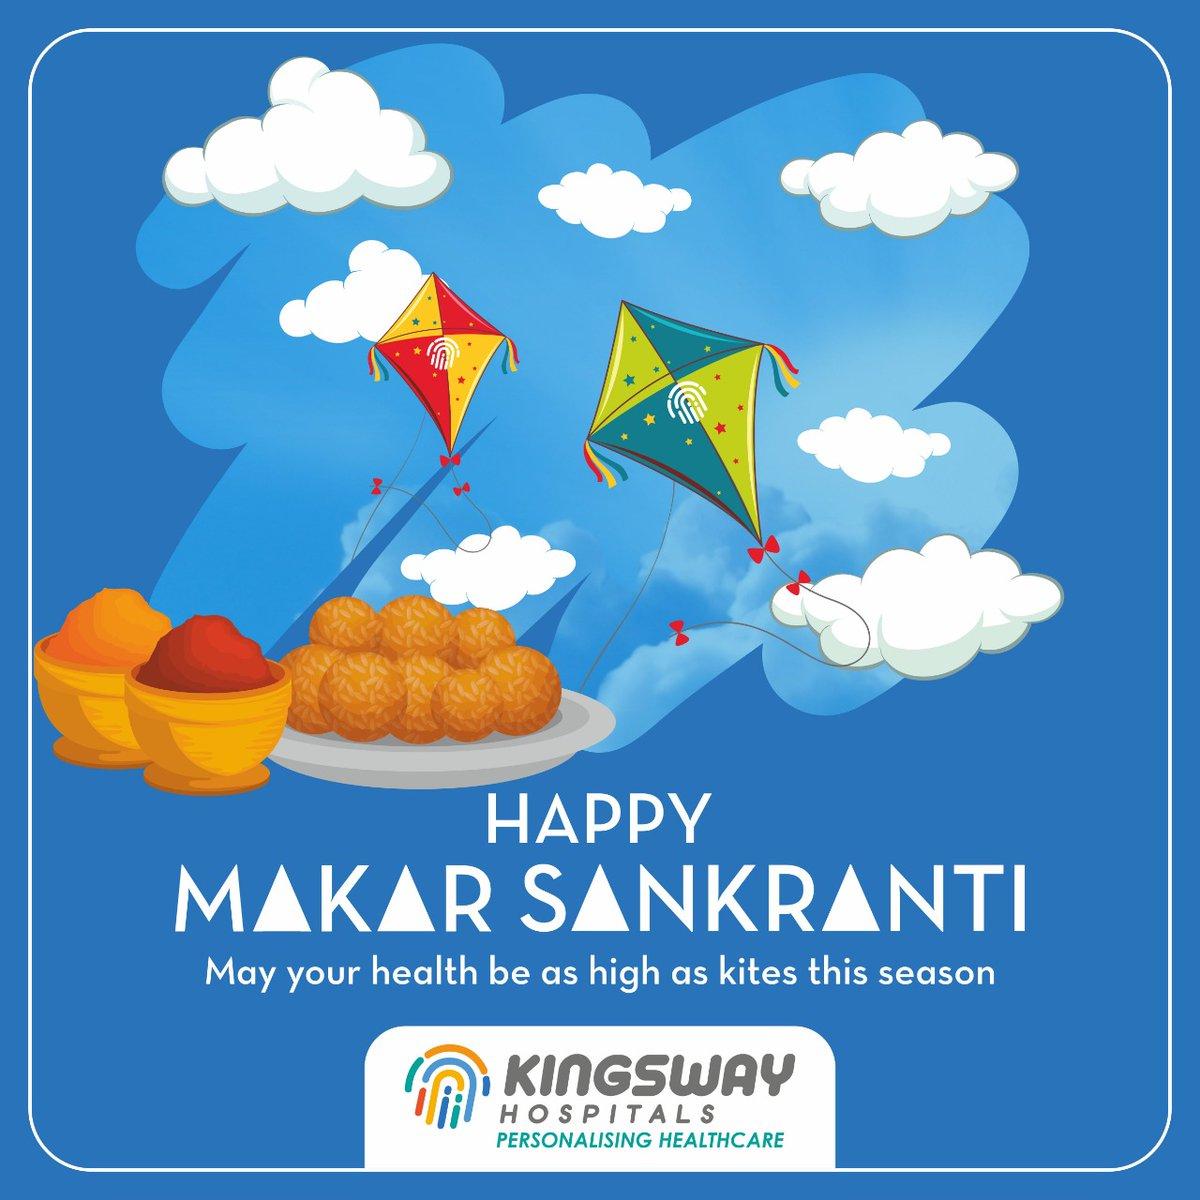 Wish you all Happy Makar Sankranti! May your health be as high as kites this season. #KH #MakarSankranti #goodhealth #centralindia #healthcaredestination pic.twitter.com/3NTuZ0yl66